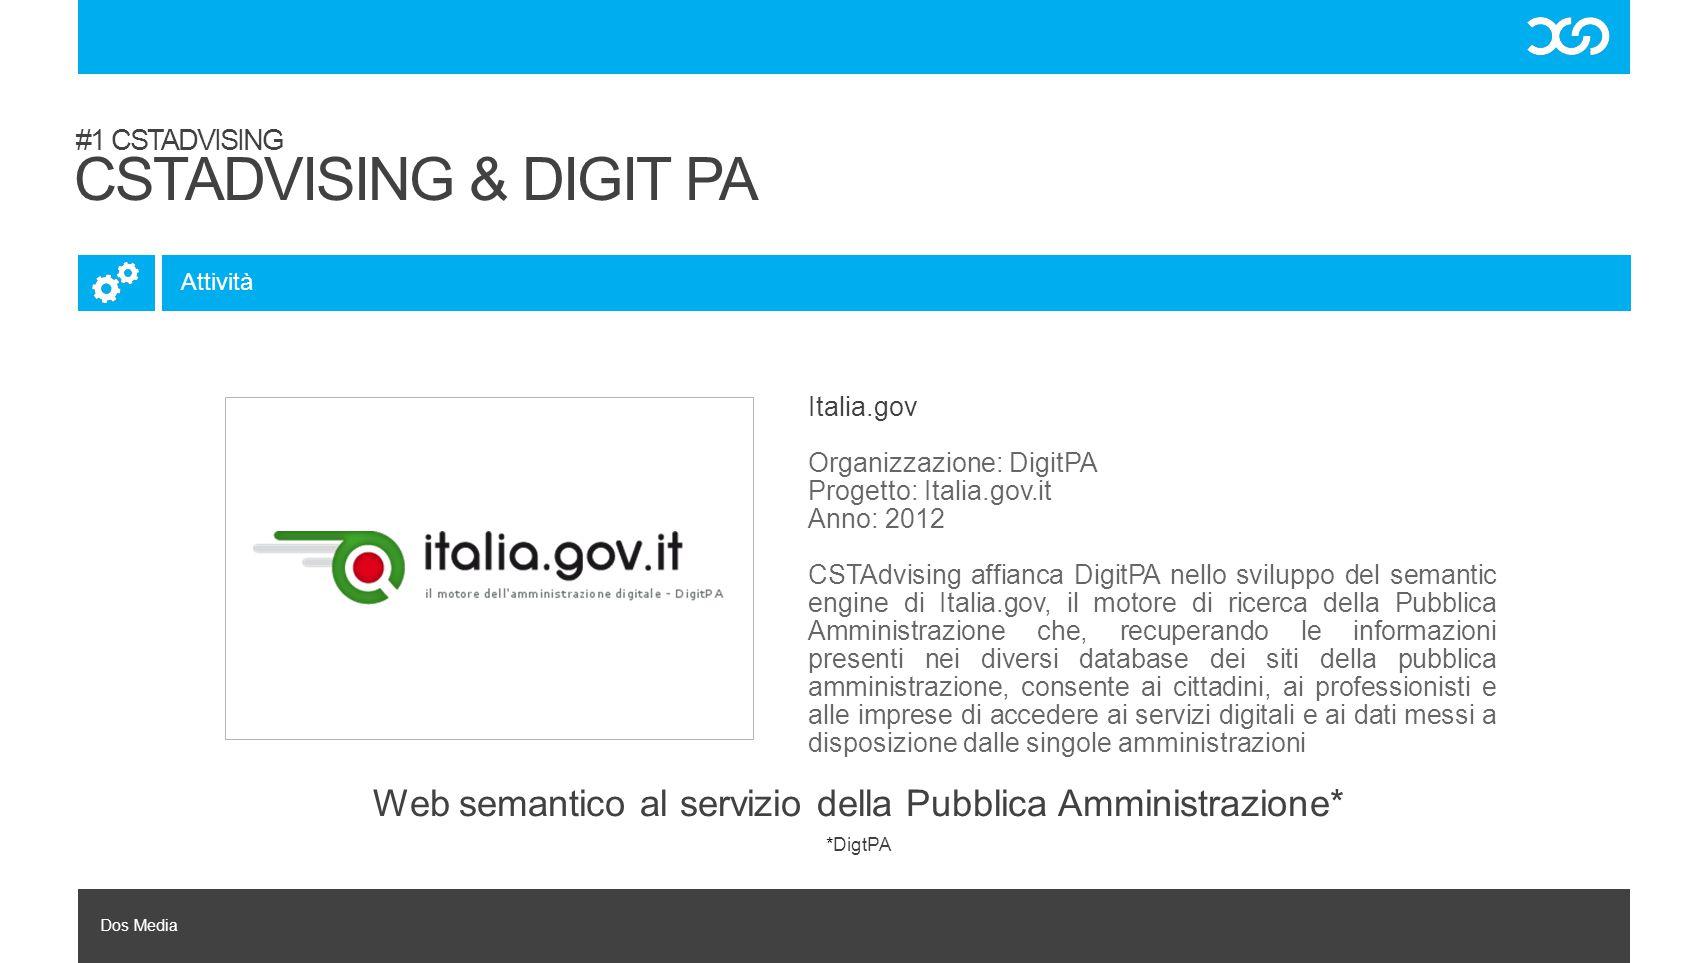 Dos Media Attività #1 CSTADVISING CSTADVISING & DIGIT PA Italia.gov Organizzazione: DigitPA Progetto: Italia.gov.it Anno: 2012 CSTAdvising affianca Di